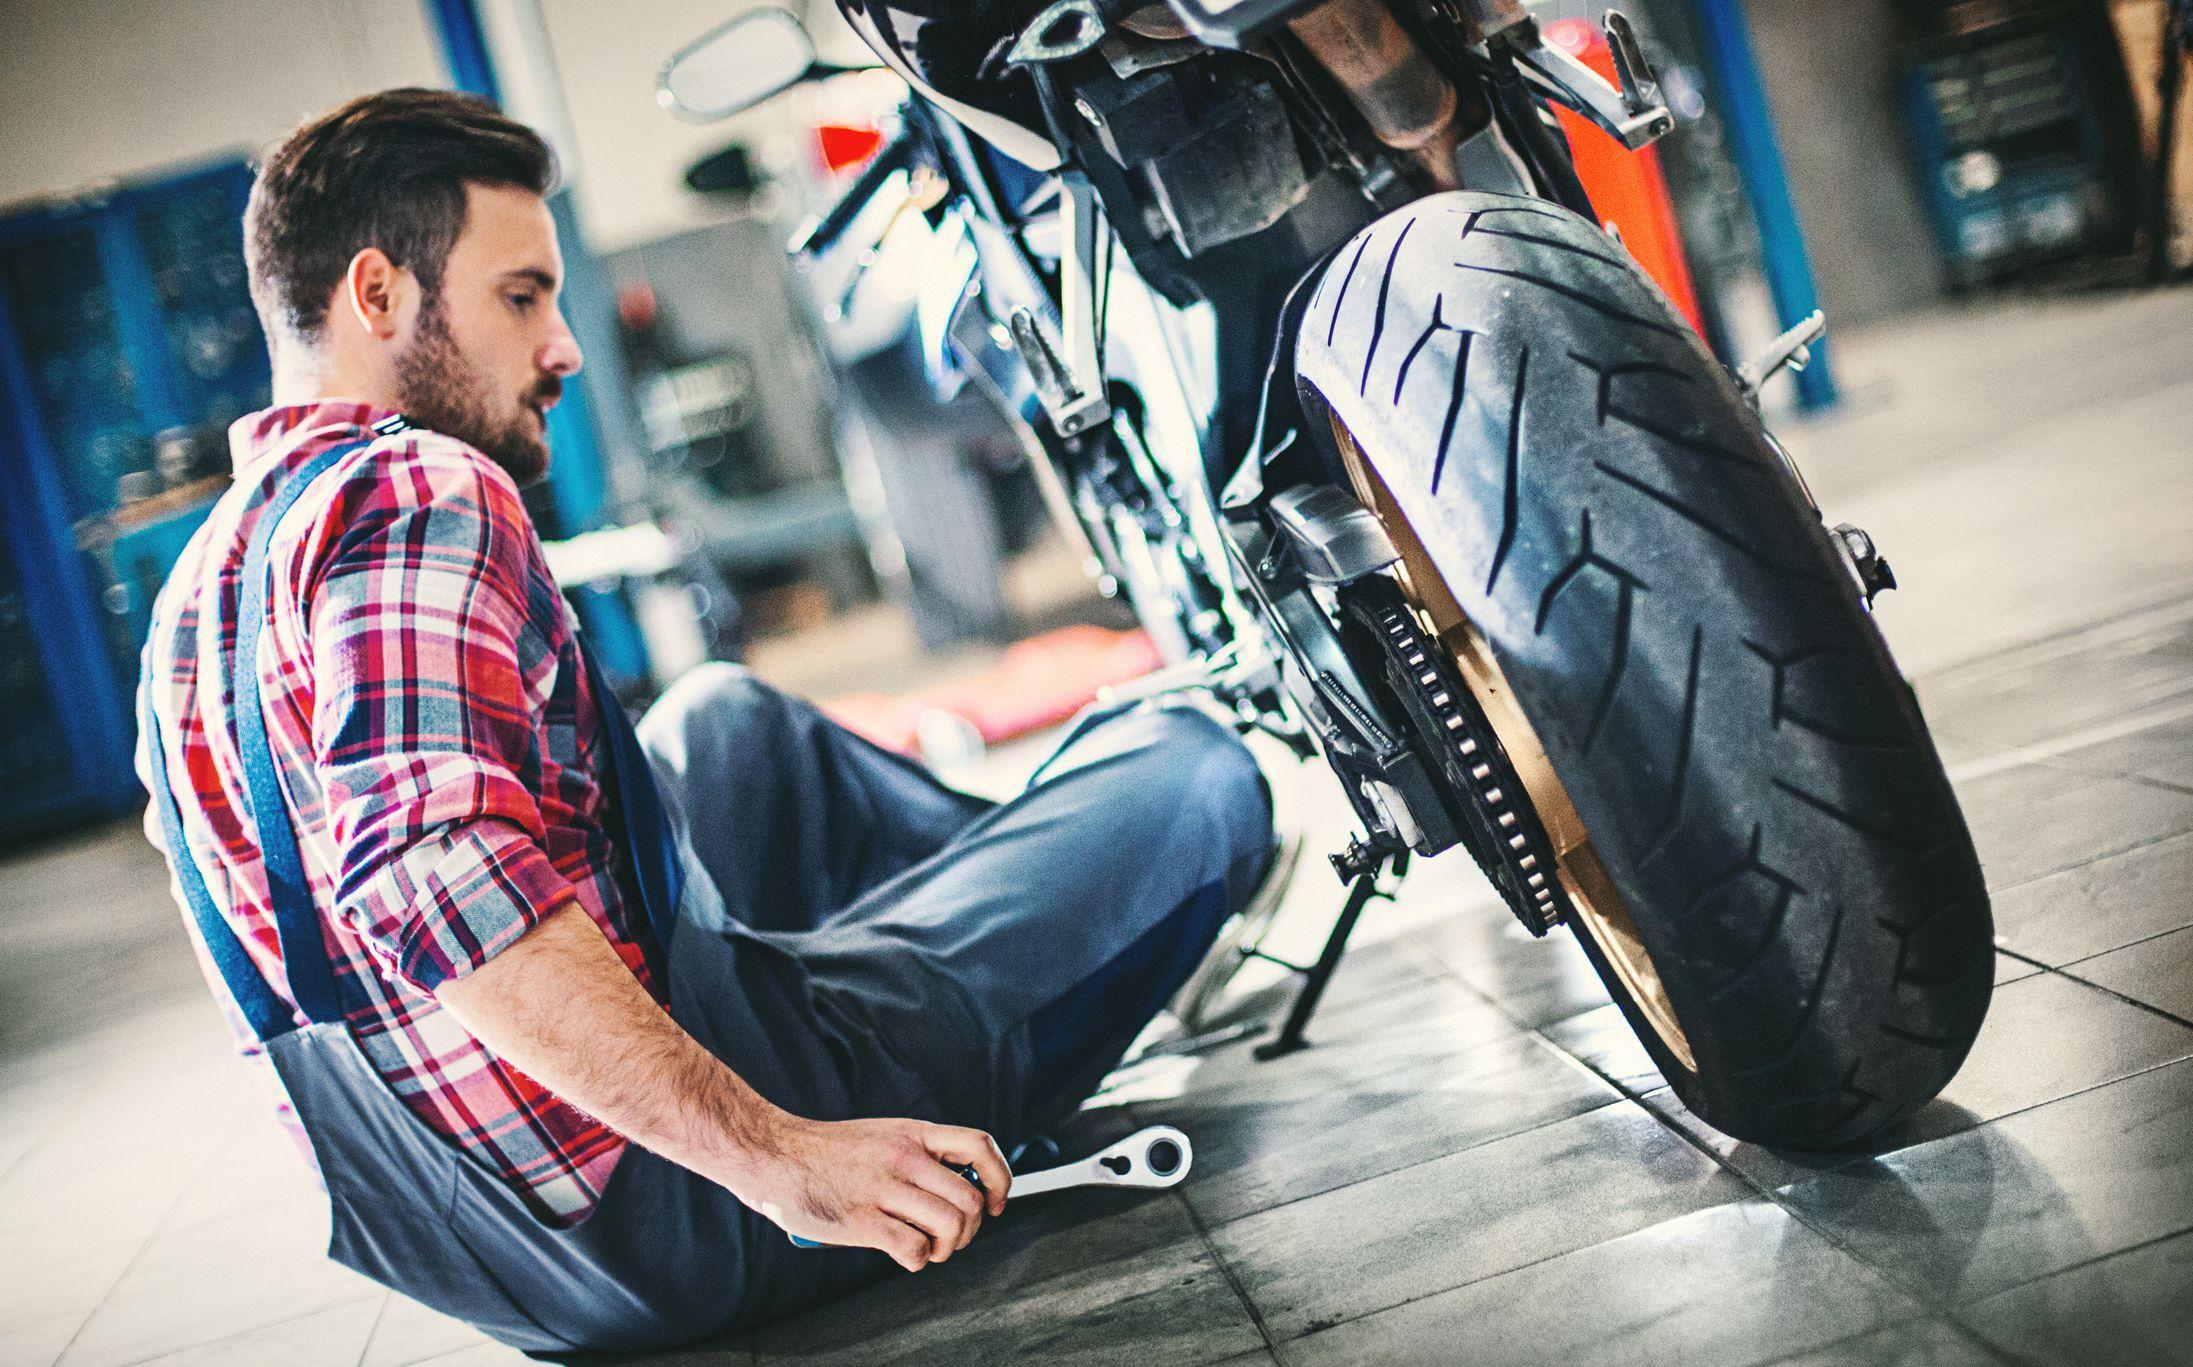 картинка сервис для мотоциклов самоотверженный труд